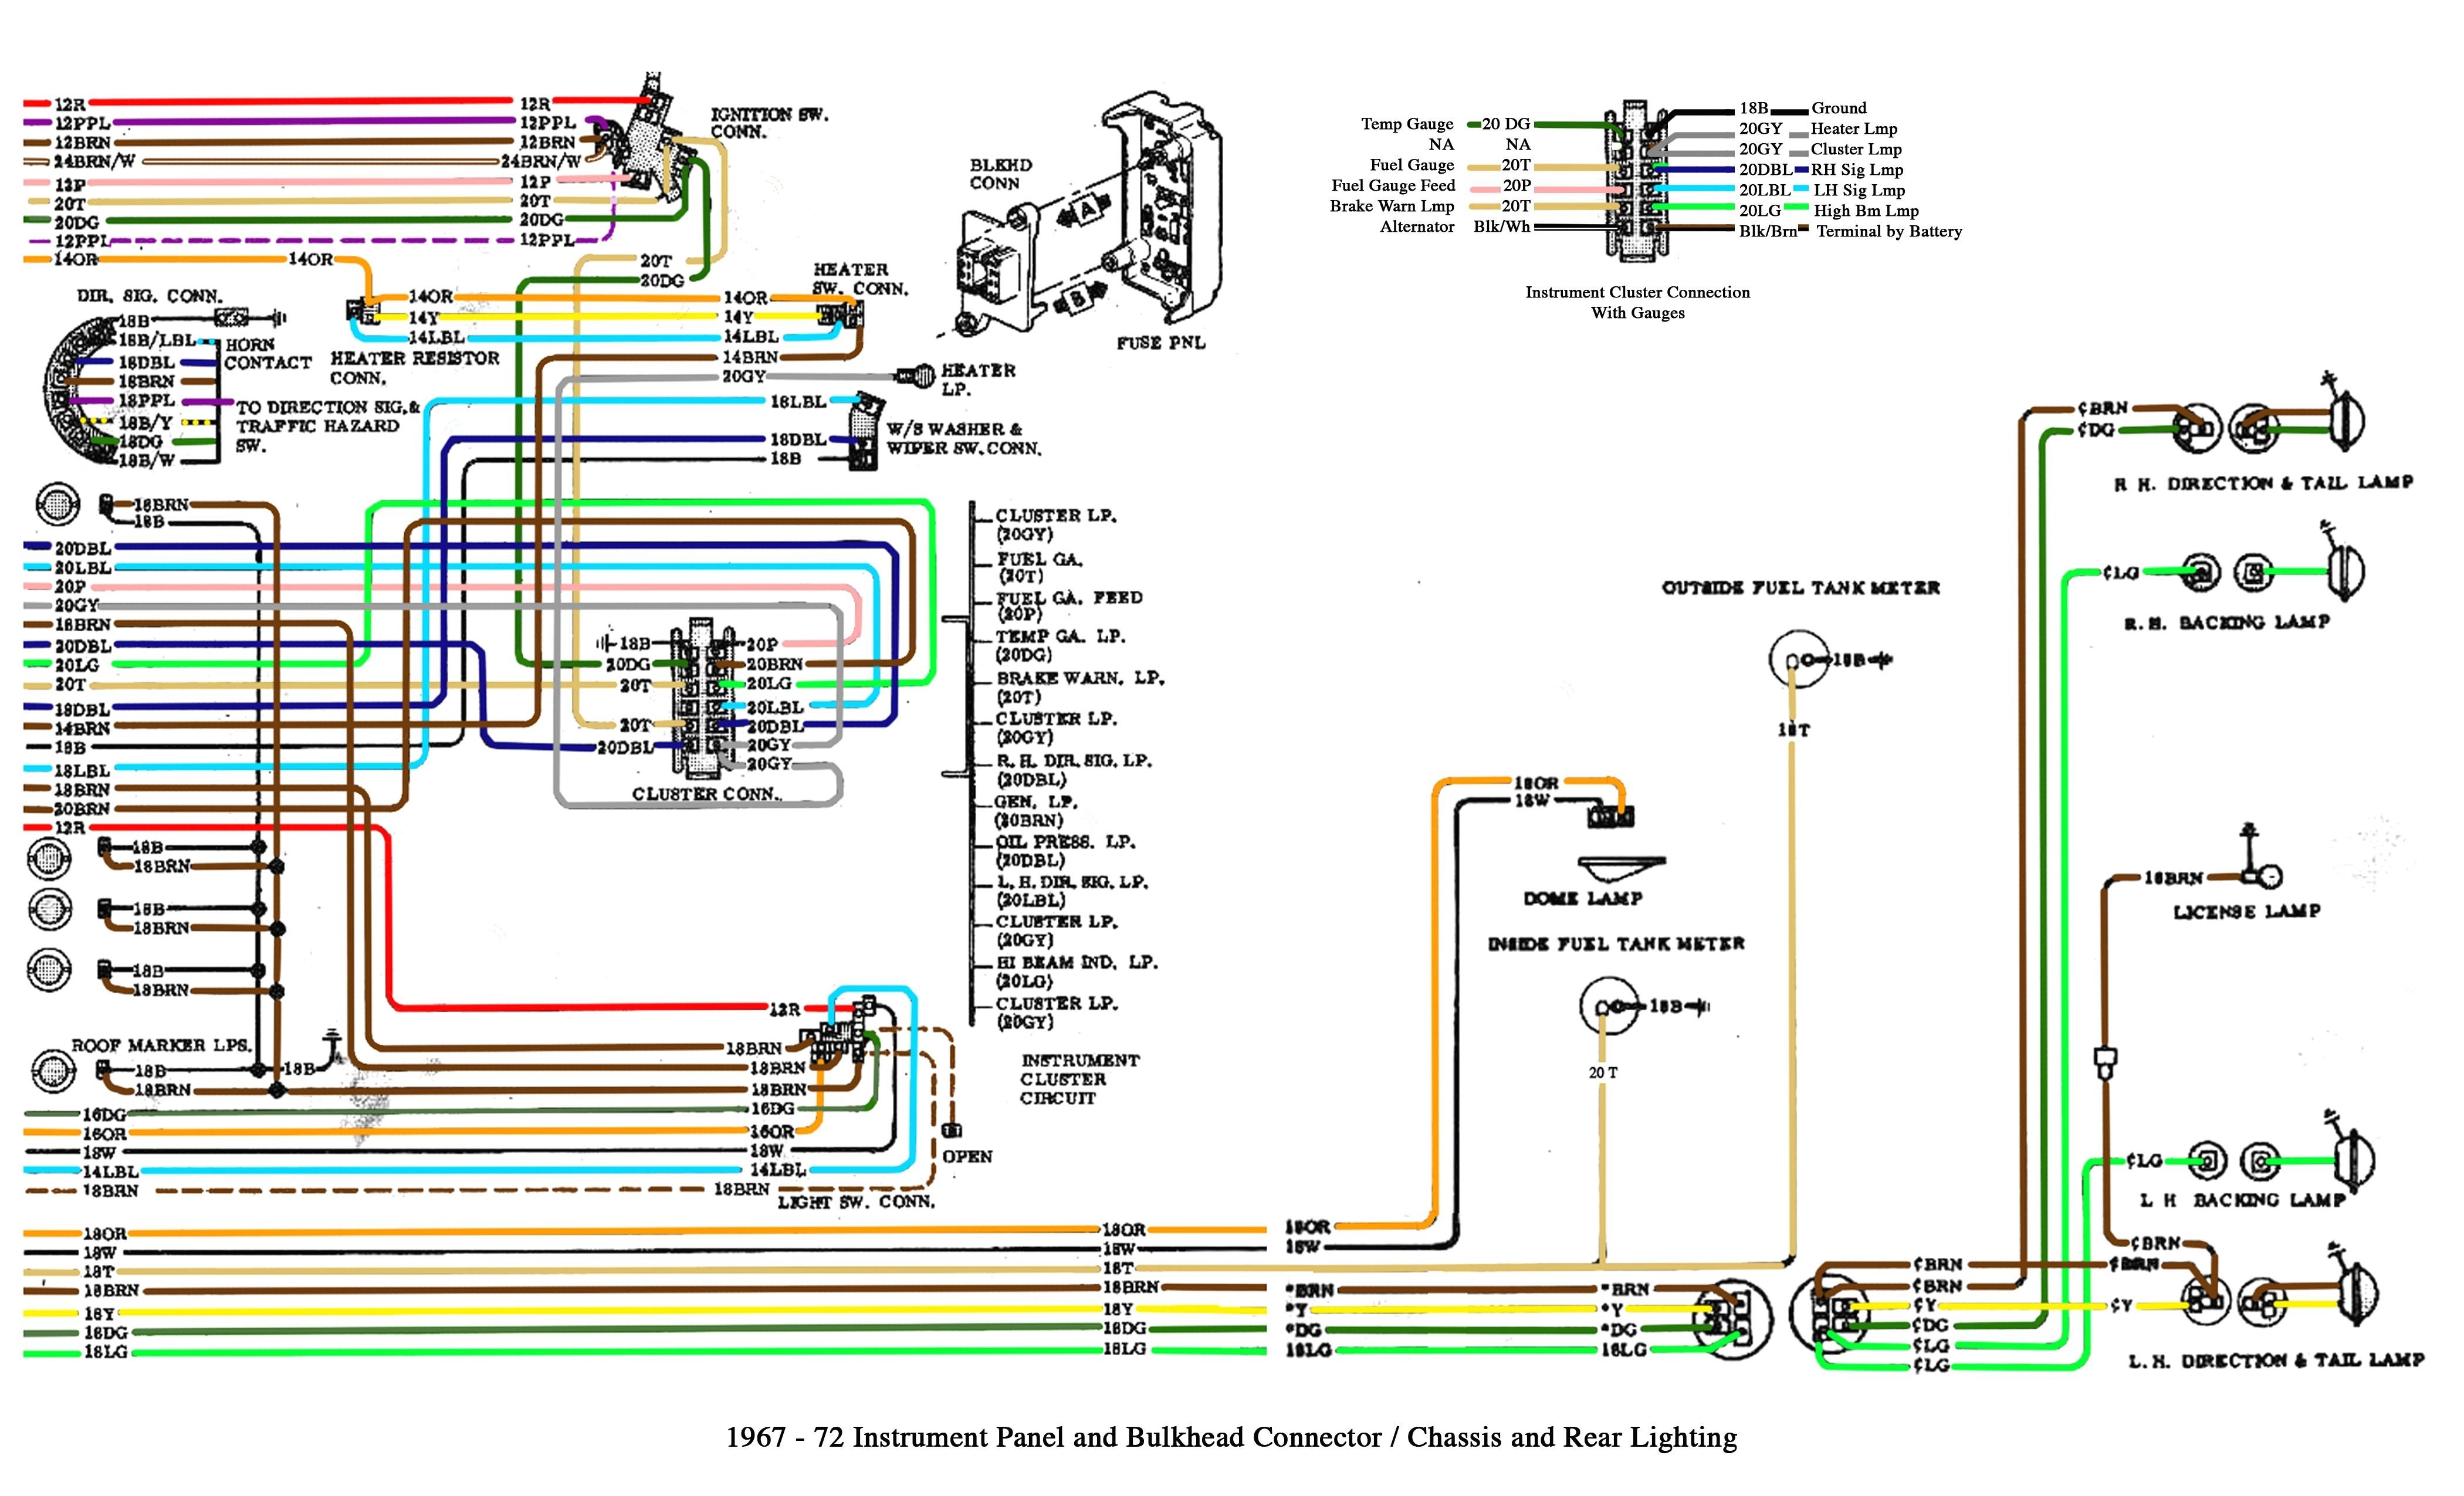 2002 Chevy Malibu Radio Wiring Diagram 1965 Chevelle Wiring Diagram